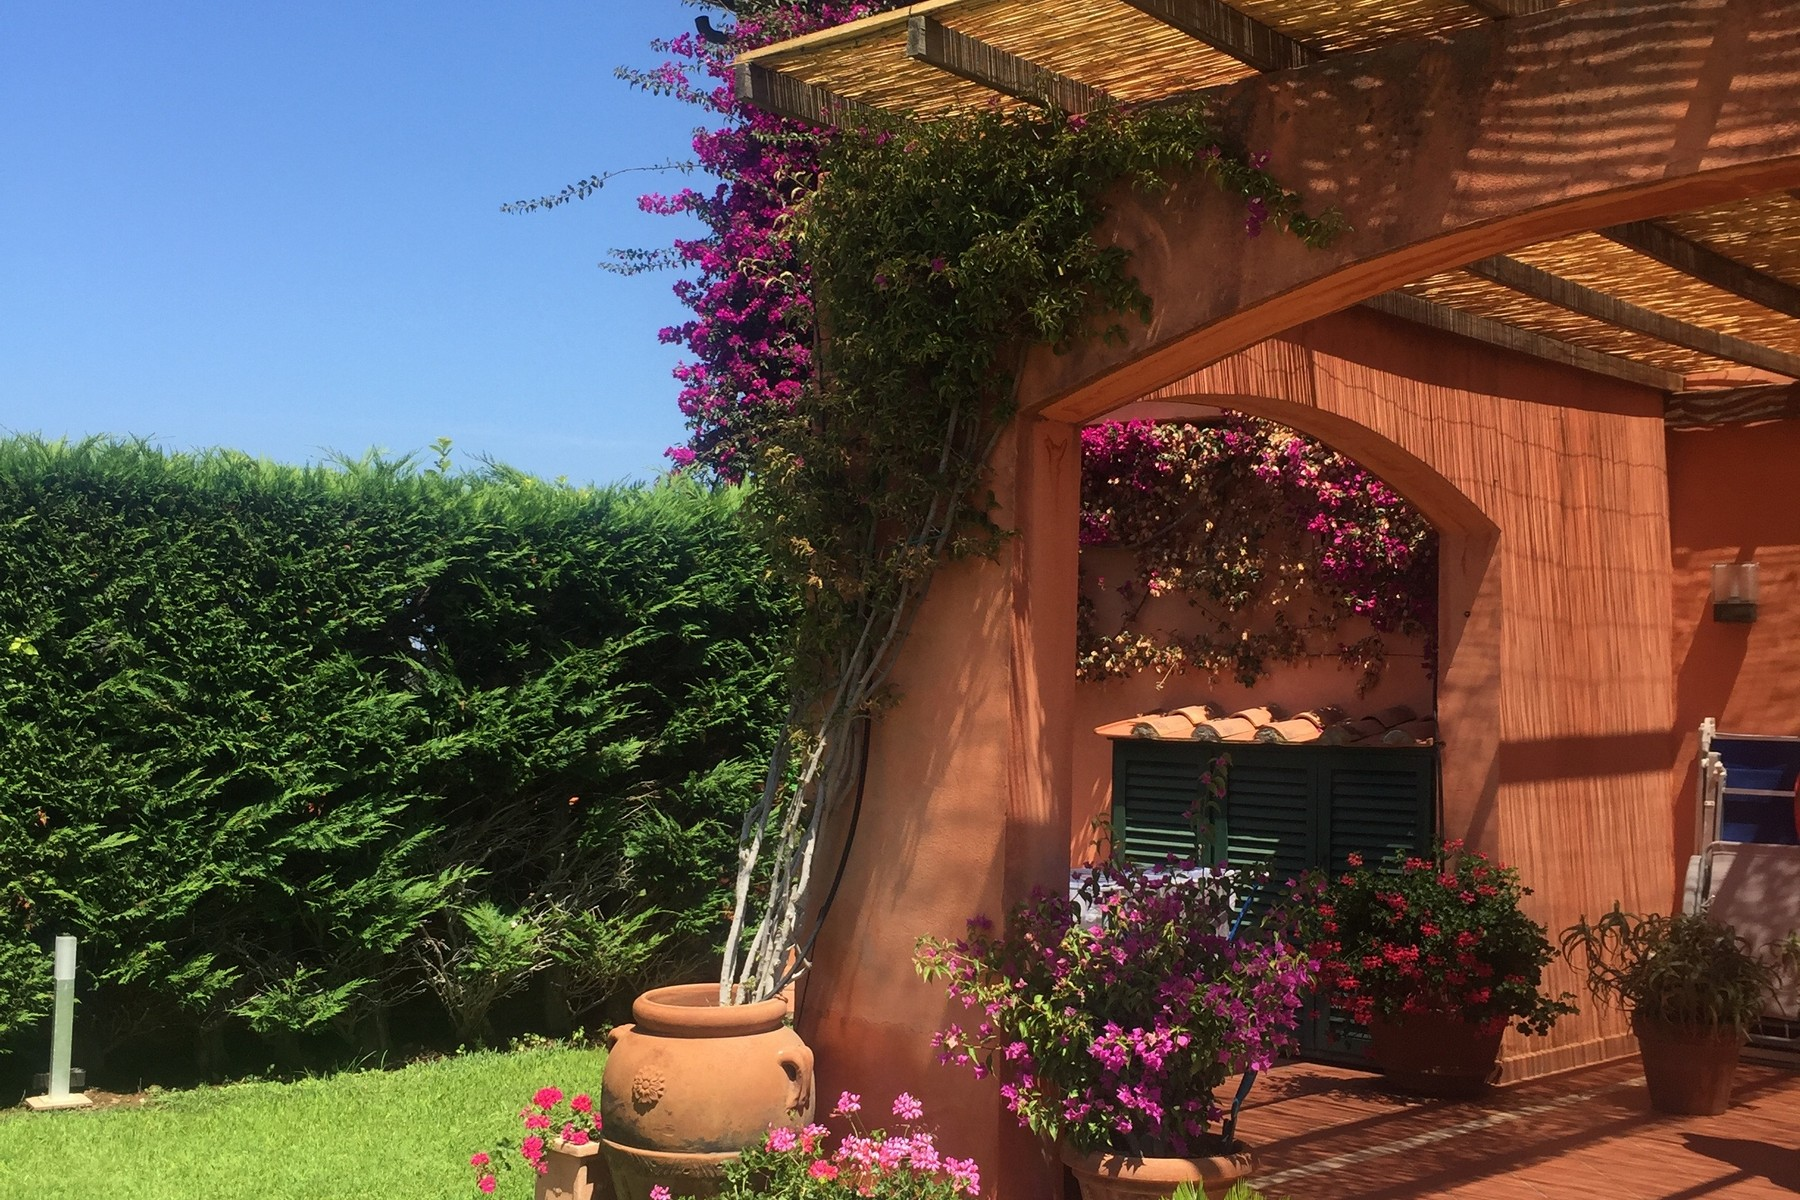 Casa indipendente in Vendita a Capoliveri: 5 locali, 190 mq - Foto 7